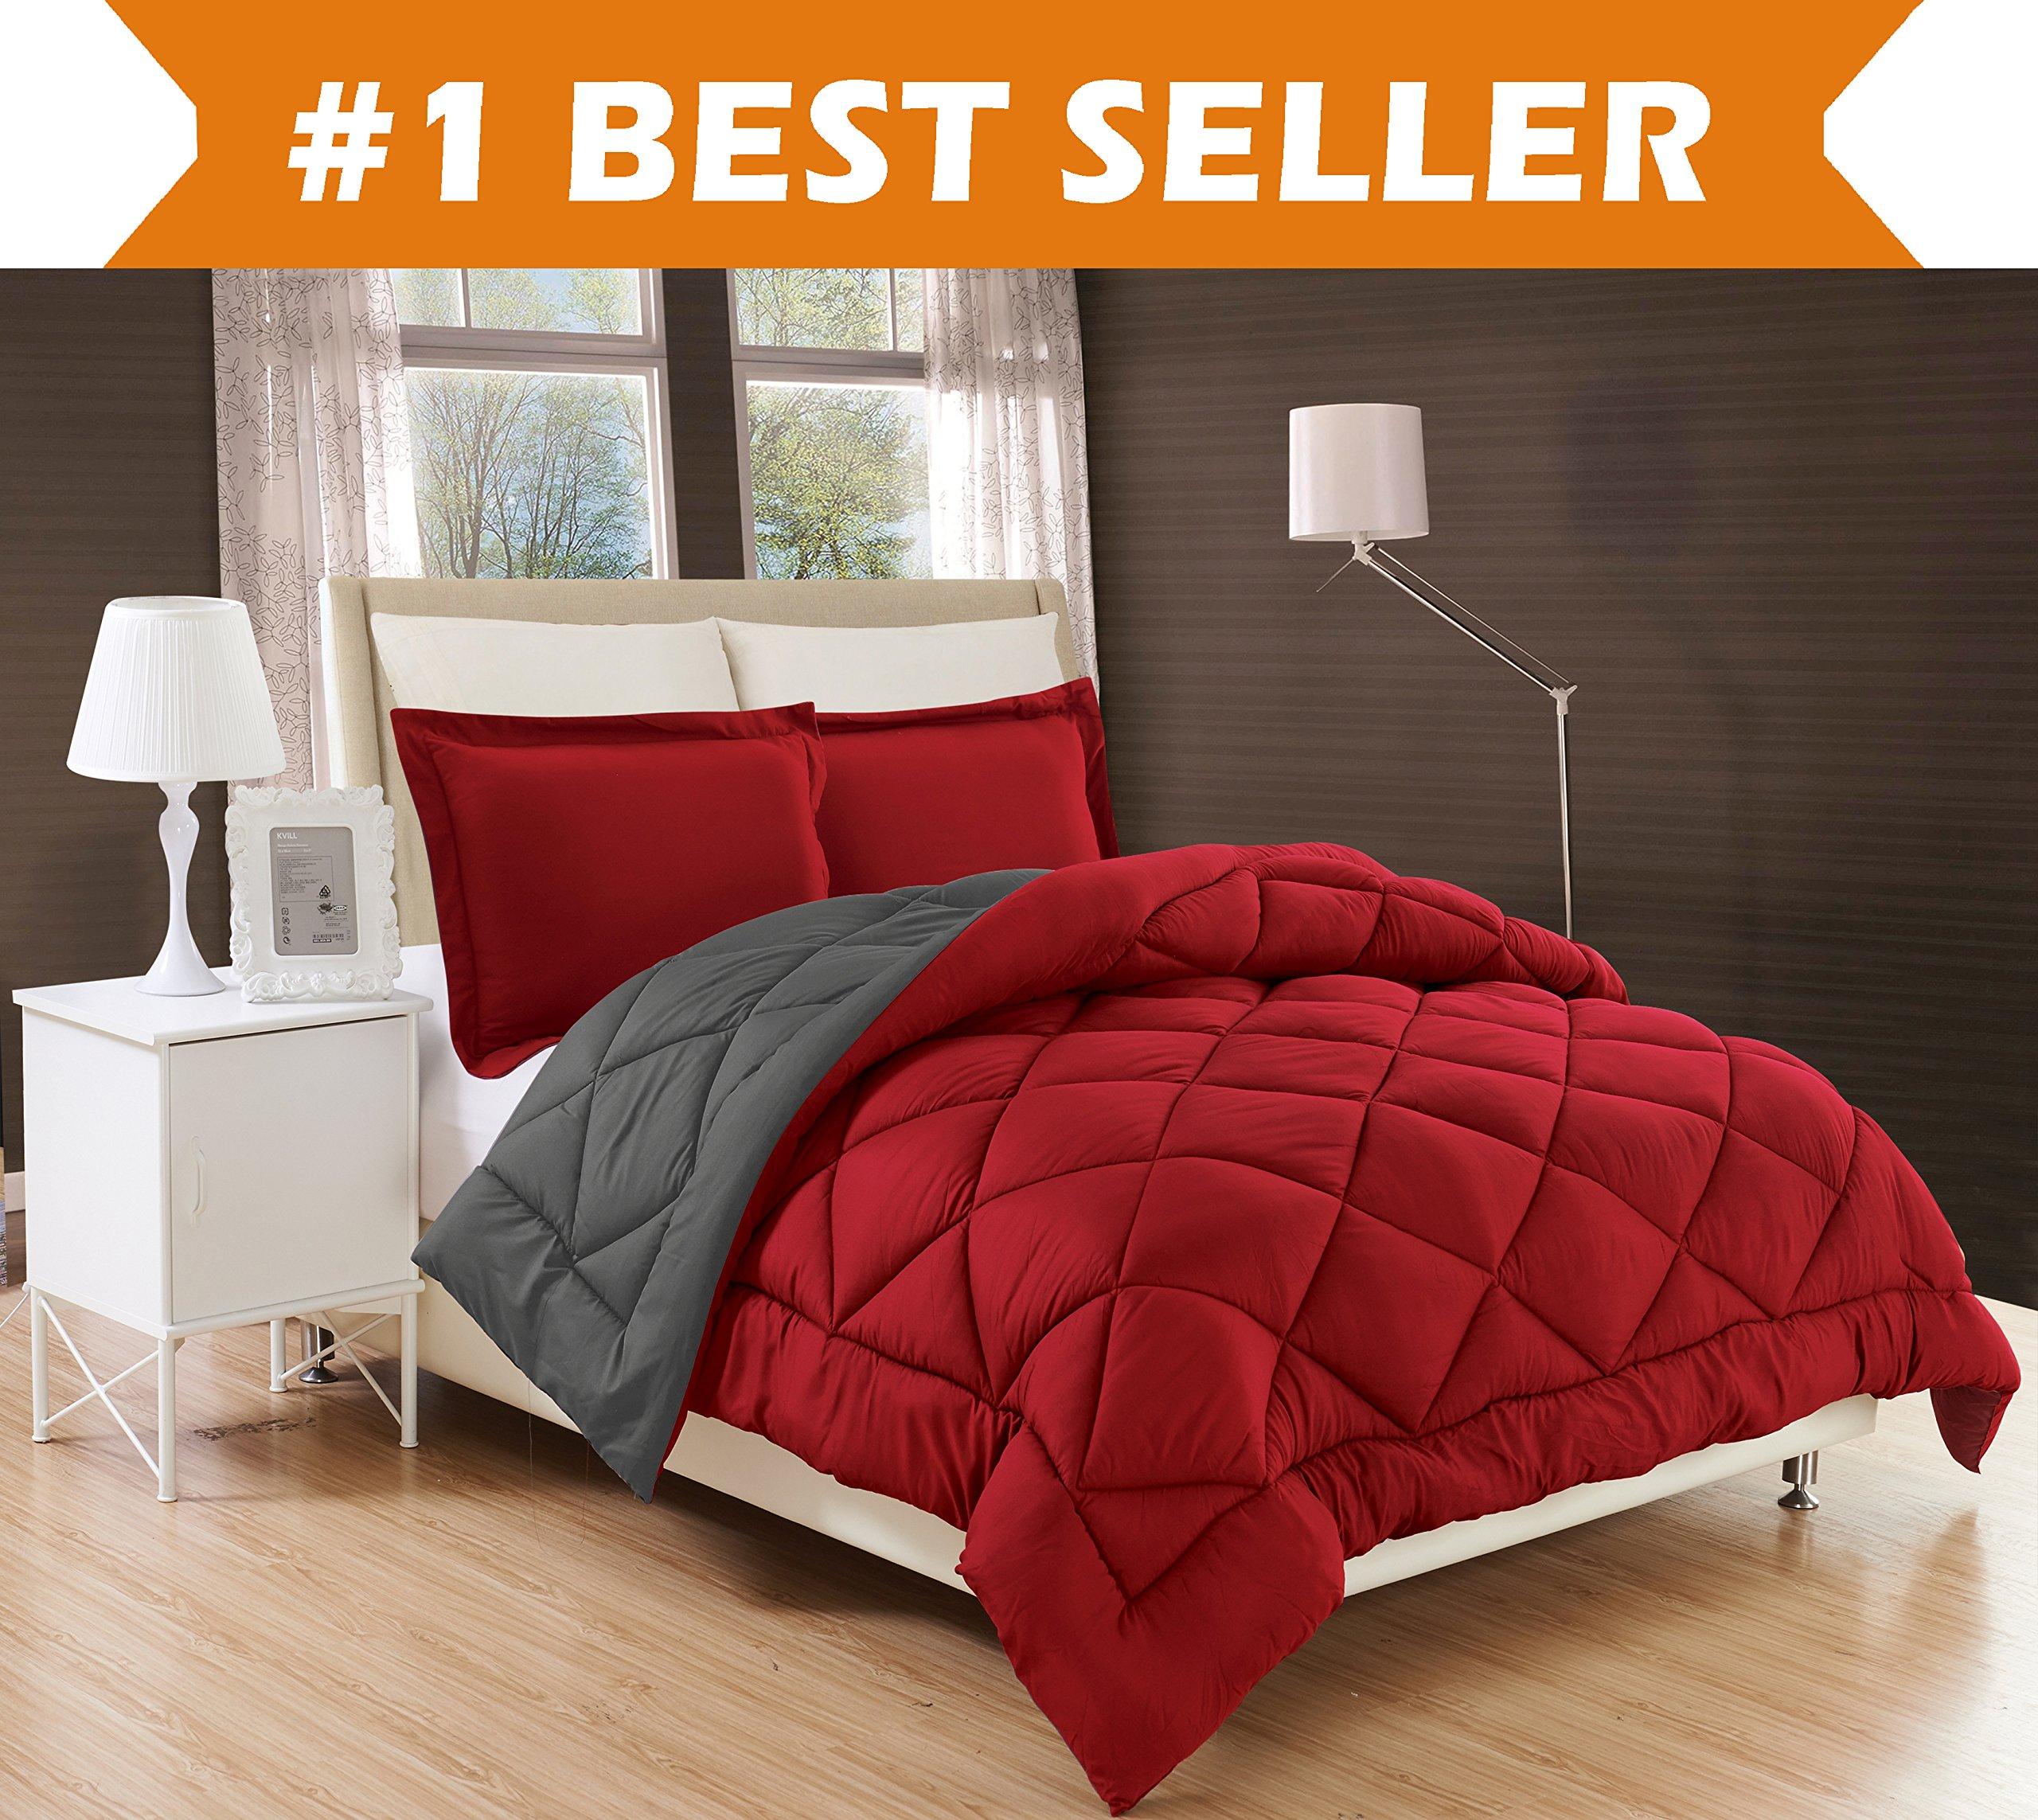 Elegant Comfort All Season Comforter and Year Round Medium Weight Super Soft Down Alternative Reversible 3-Piece Comforter Set, King, Burgundy/Grey by Elegant Comfort